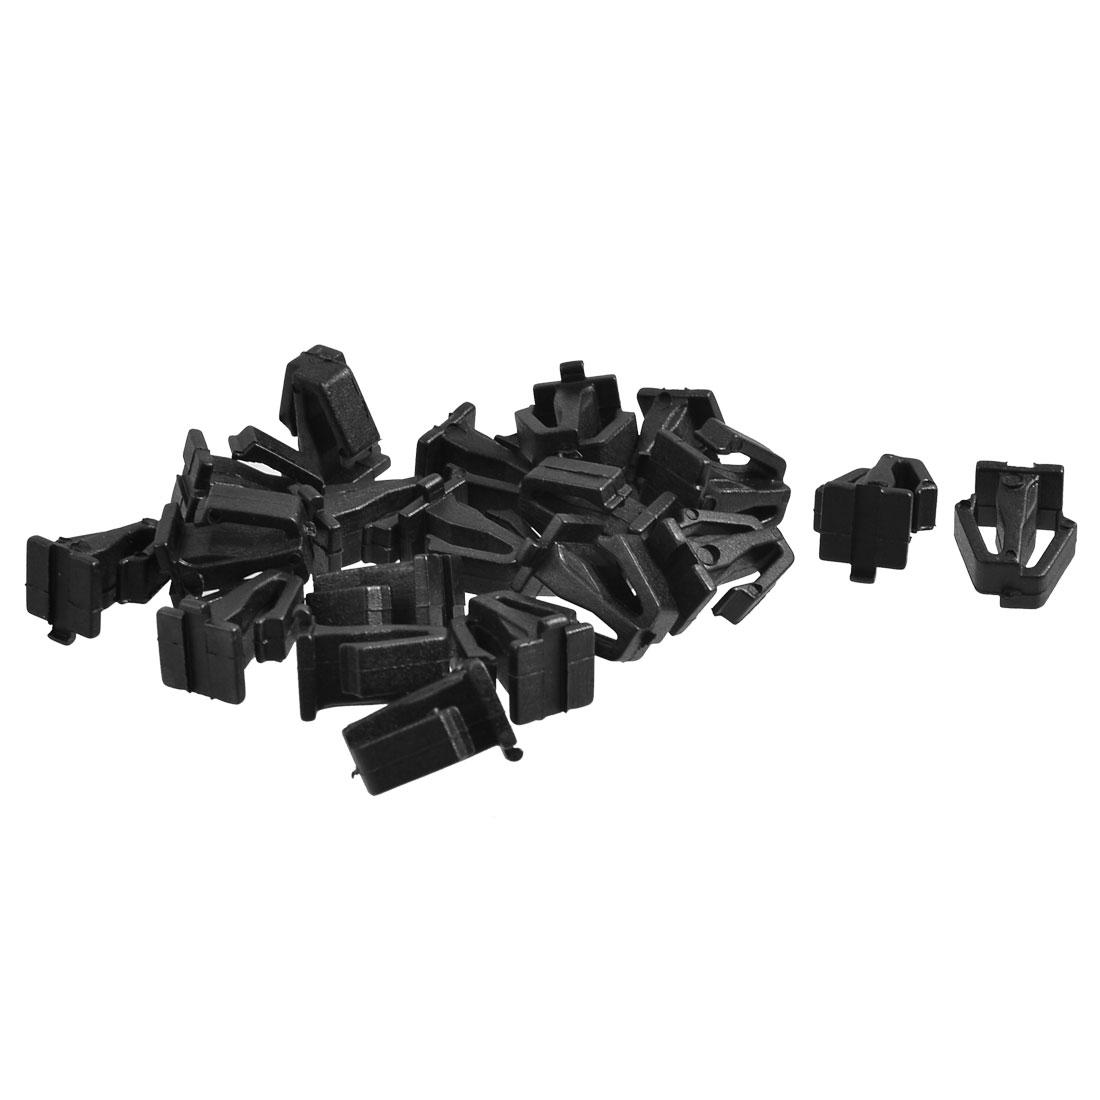 Plastic Rivets Fastener Car Fender Bumper Push in Clips Black 20 Pcs